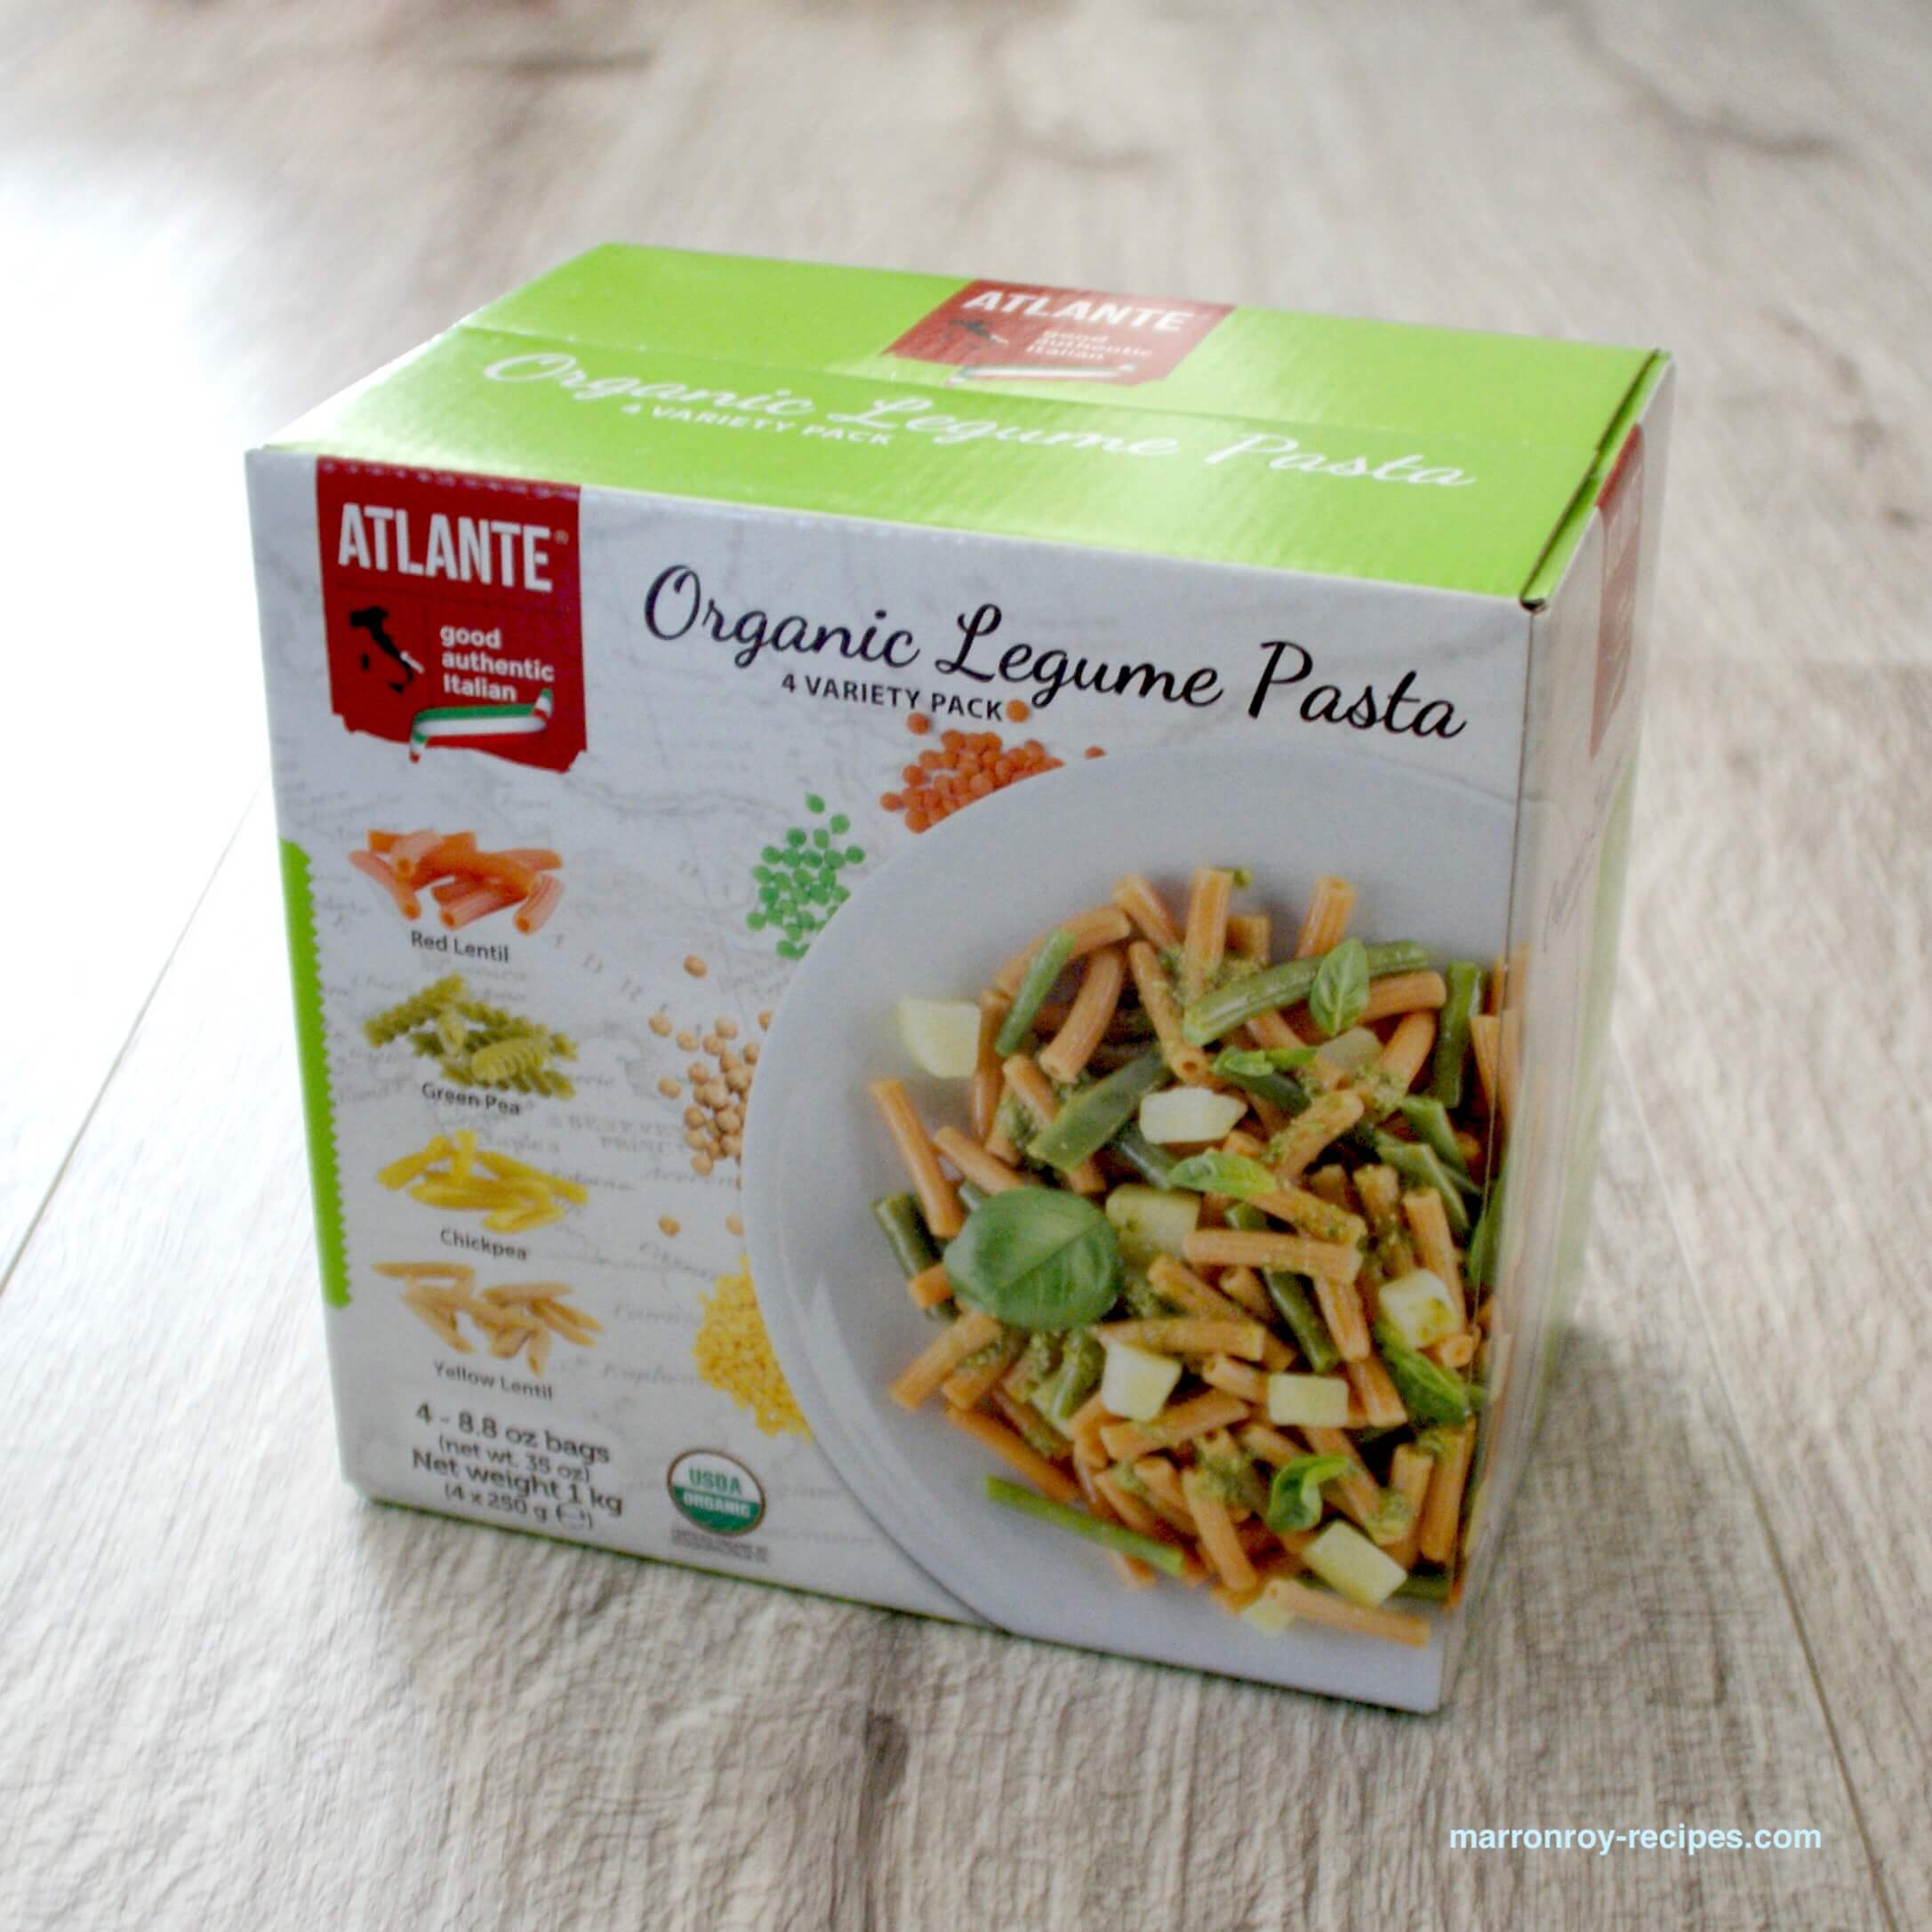 atlante豆パスタ